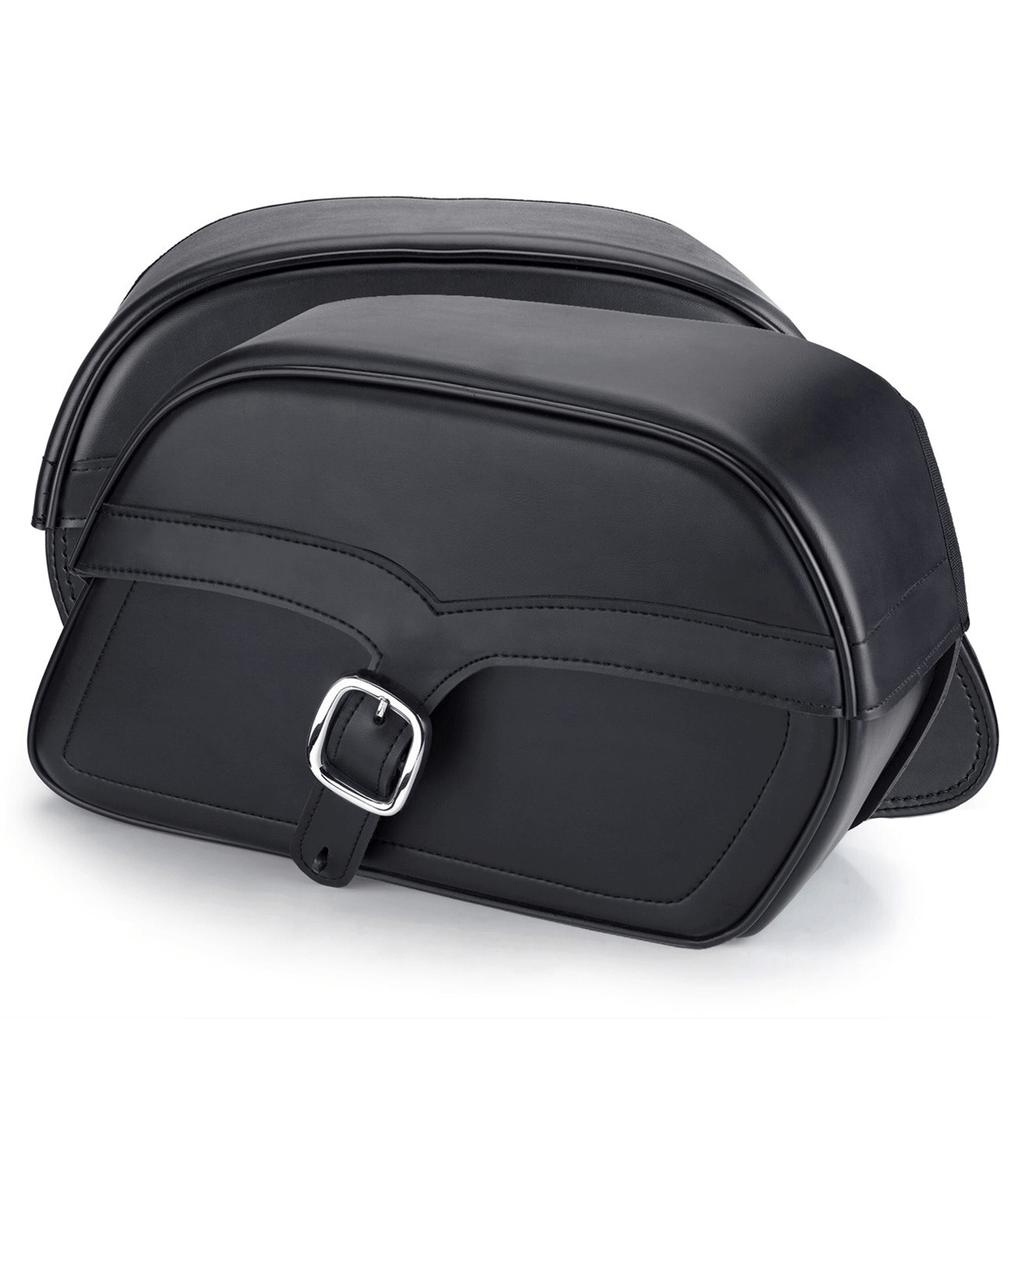 Honda 1500 Valkyrie Interstate SS Slanted Medium Motorcycle Saddlebags Both Bags View